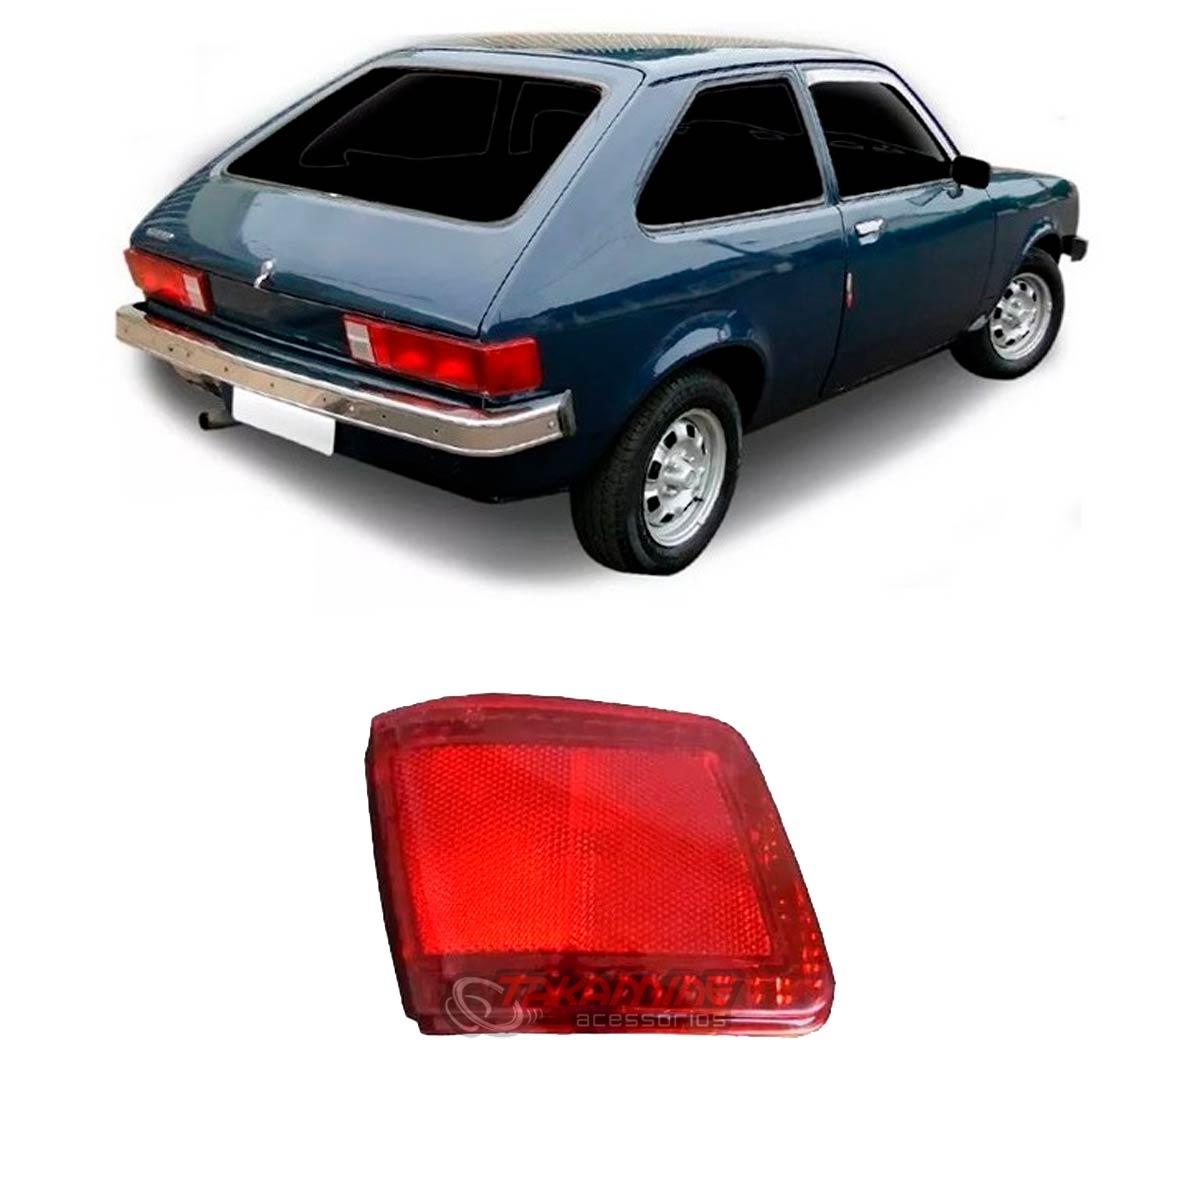 Lanterna traseira Chevette Hatch canto 1980 1981 1982 lado esquerdo